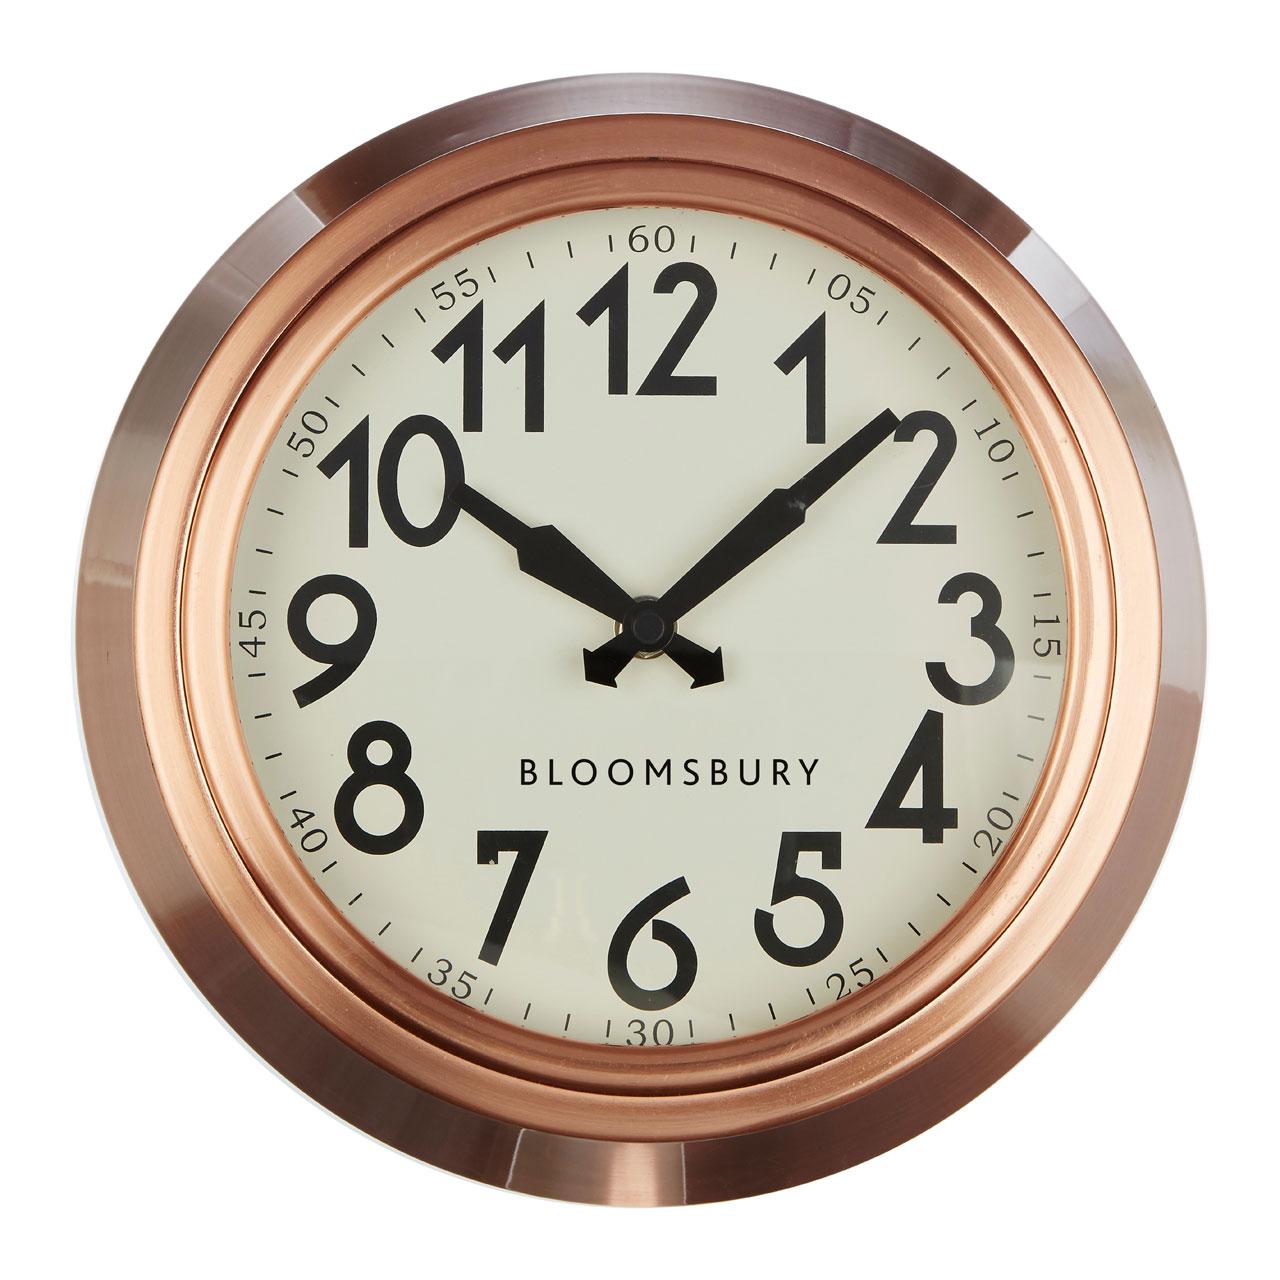 Image of Bloomsbury Wall Clock